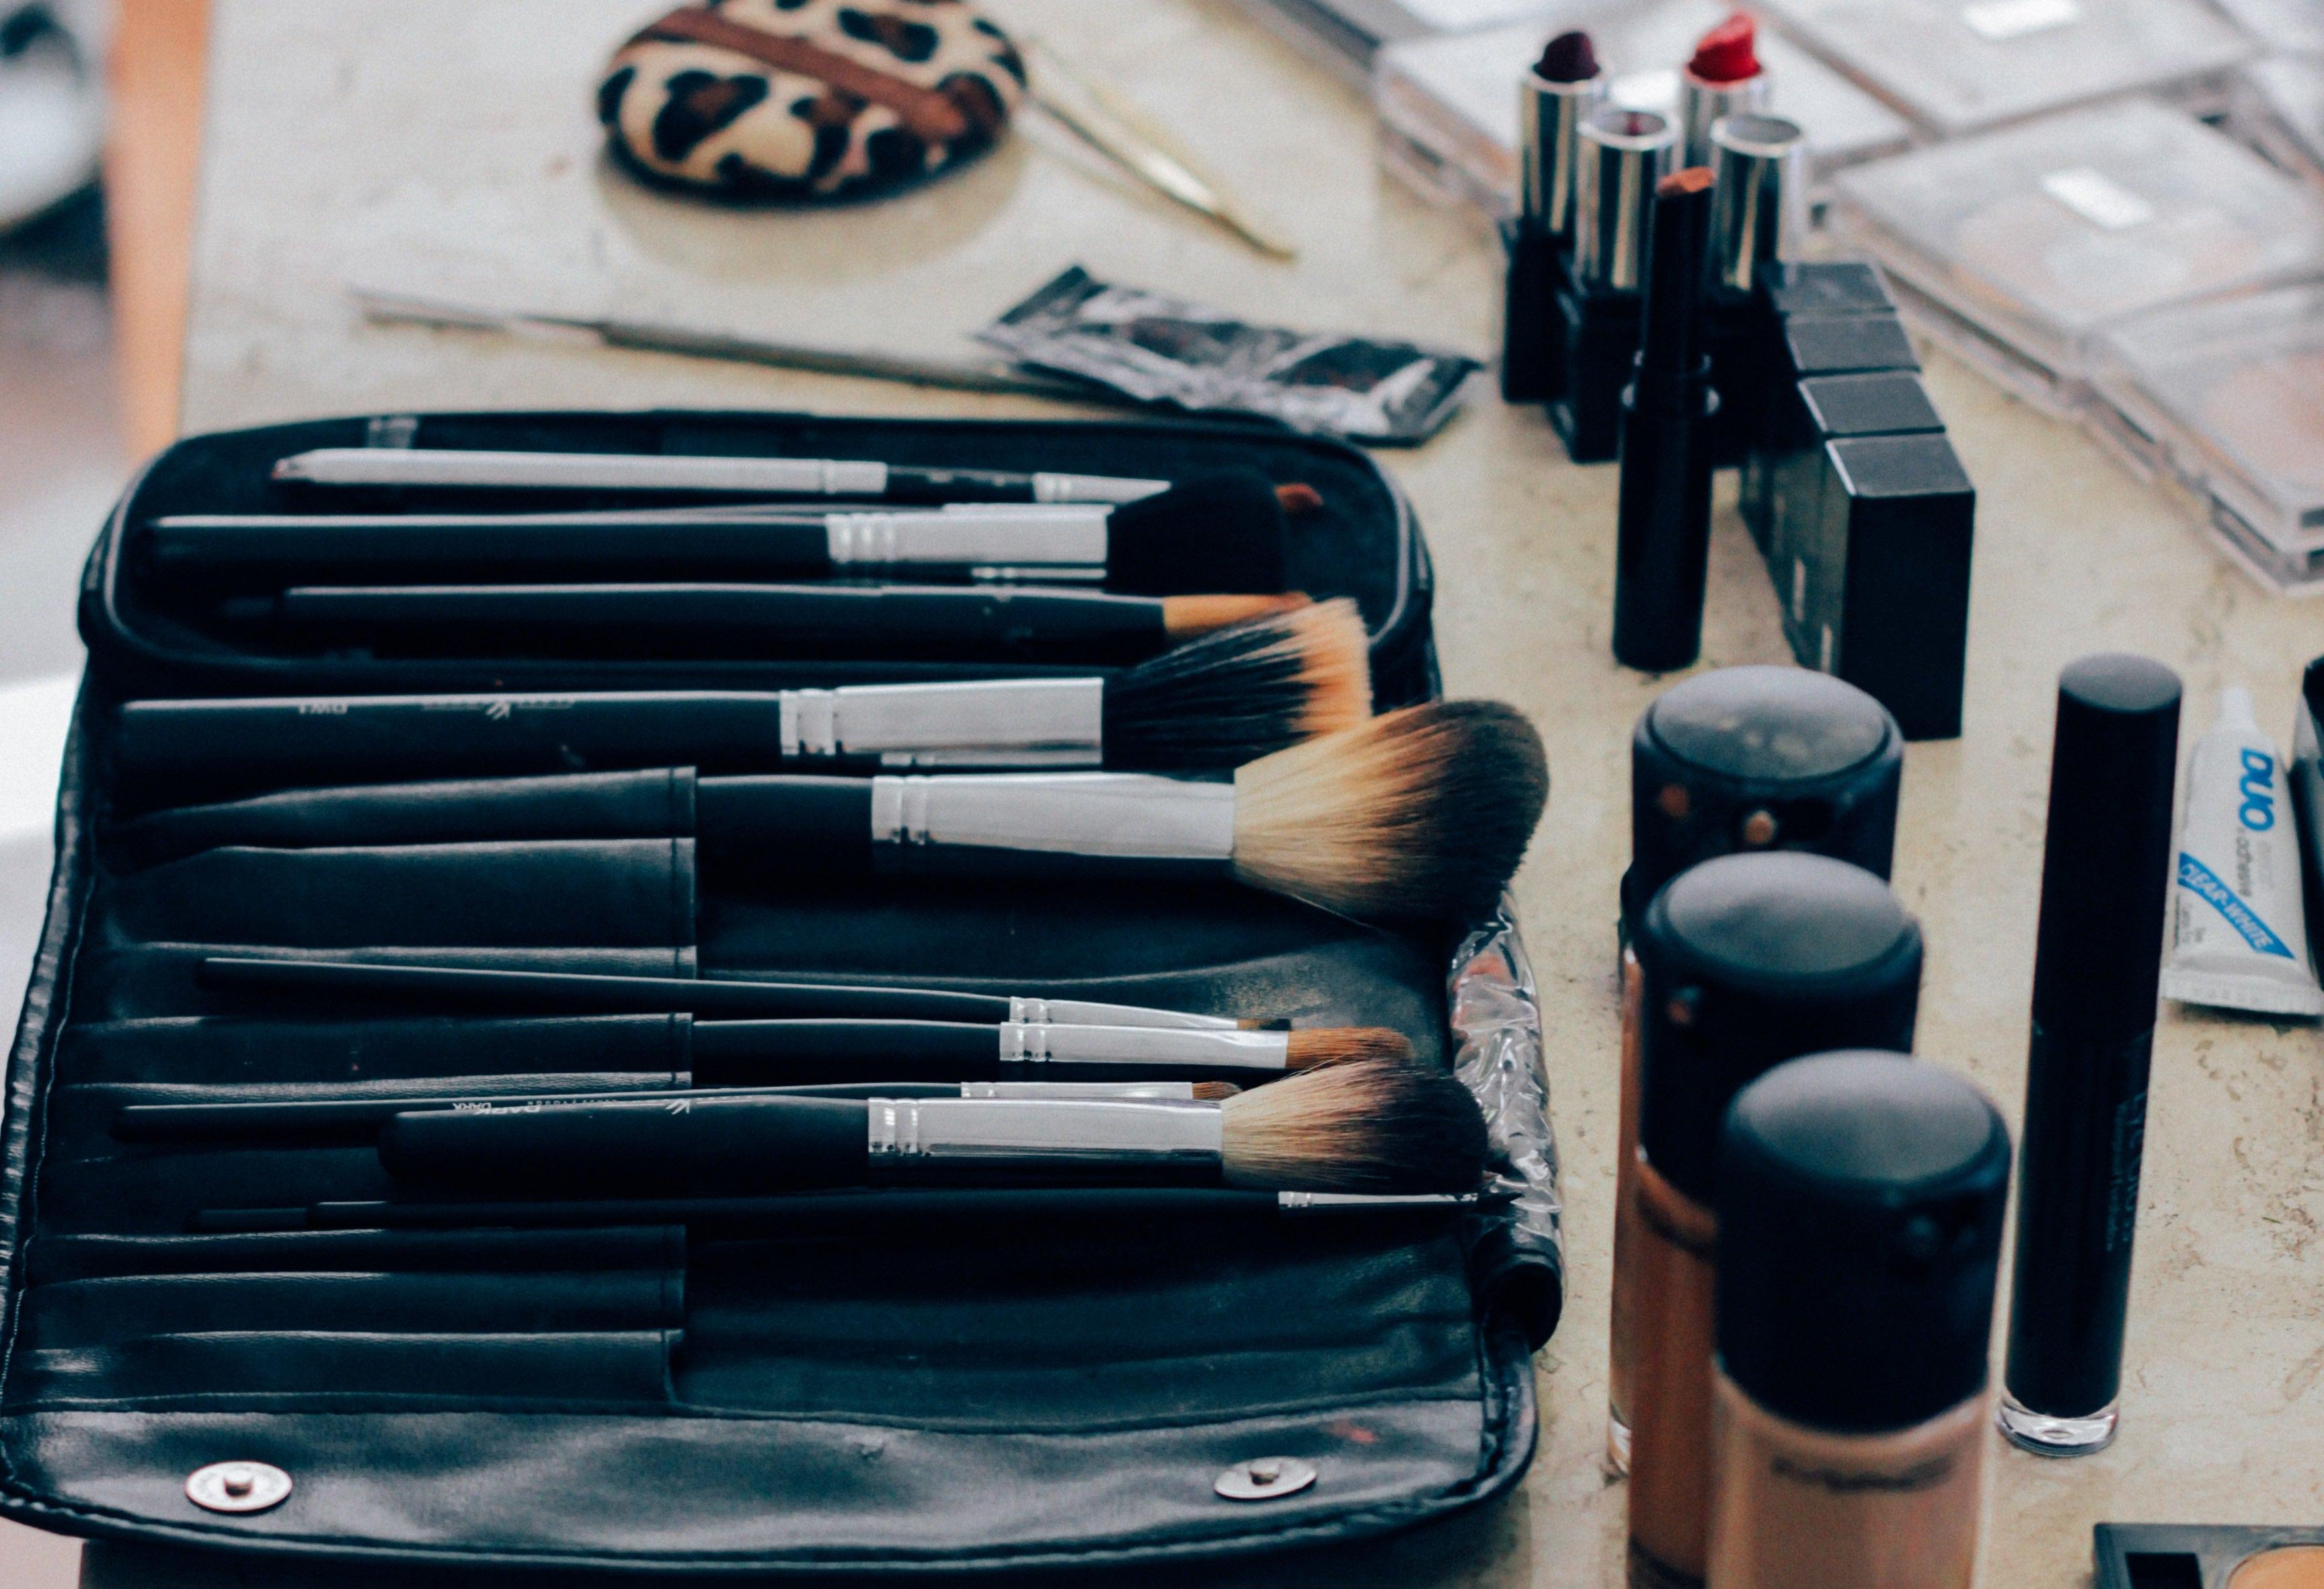 array of makeup brushes next to bottles of makeup.